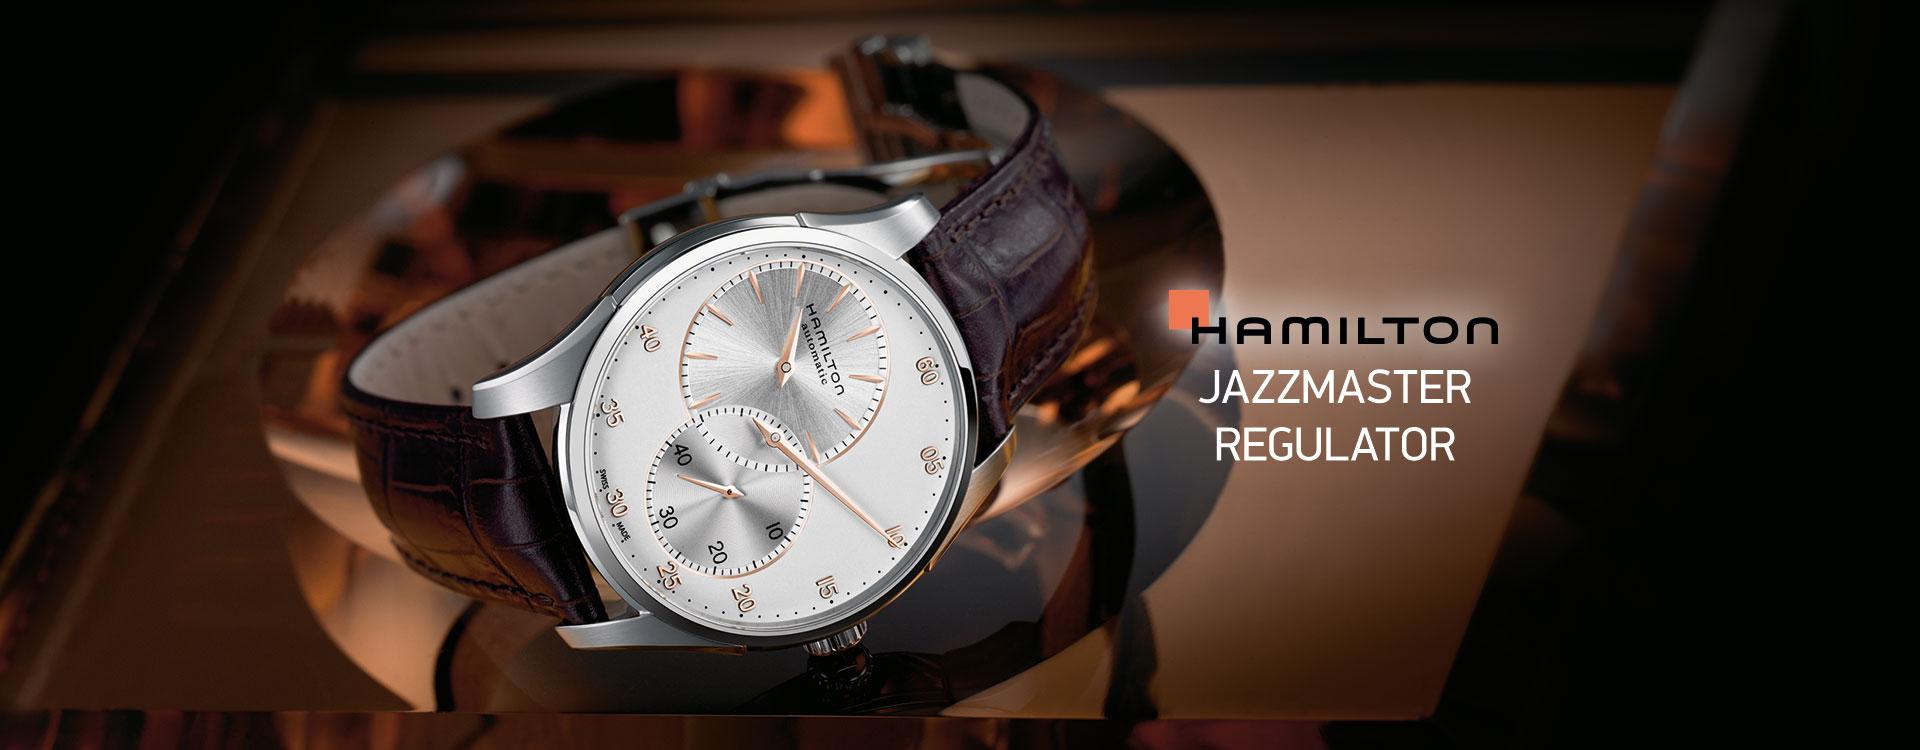 hamilton-jazzmaster-regulator